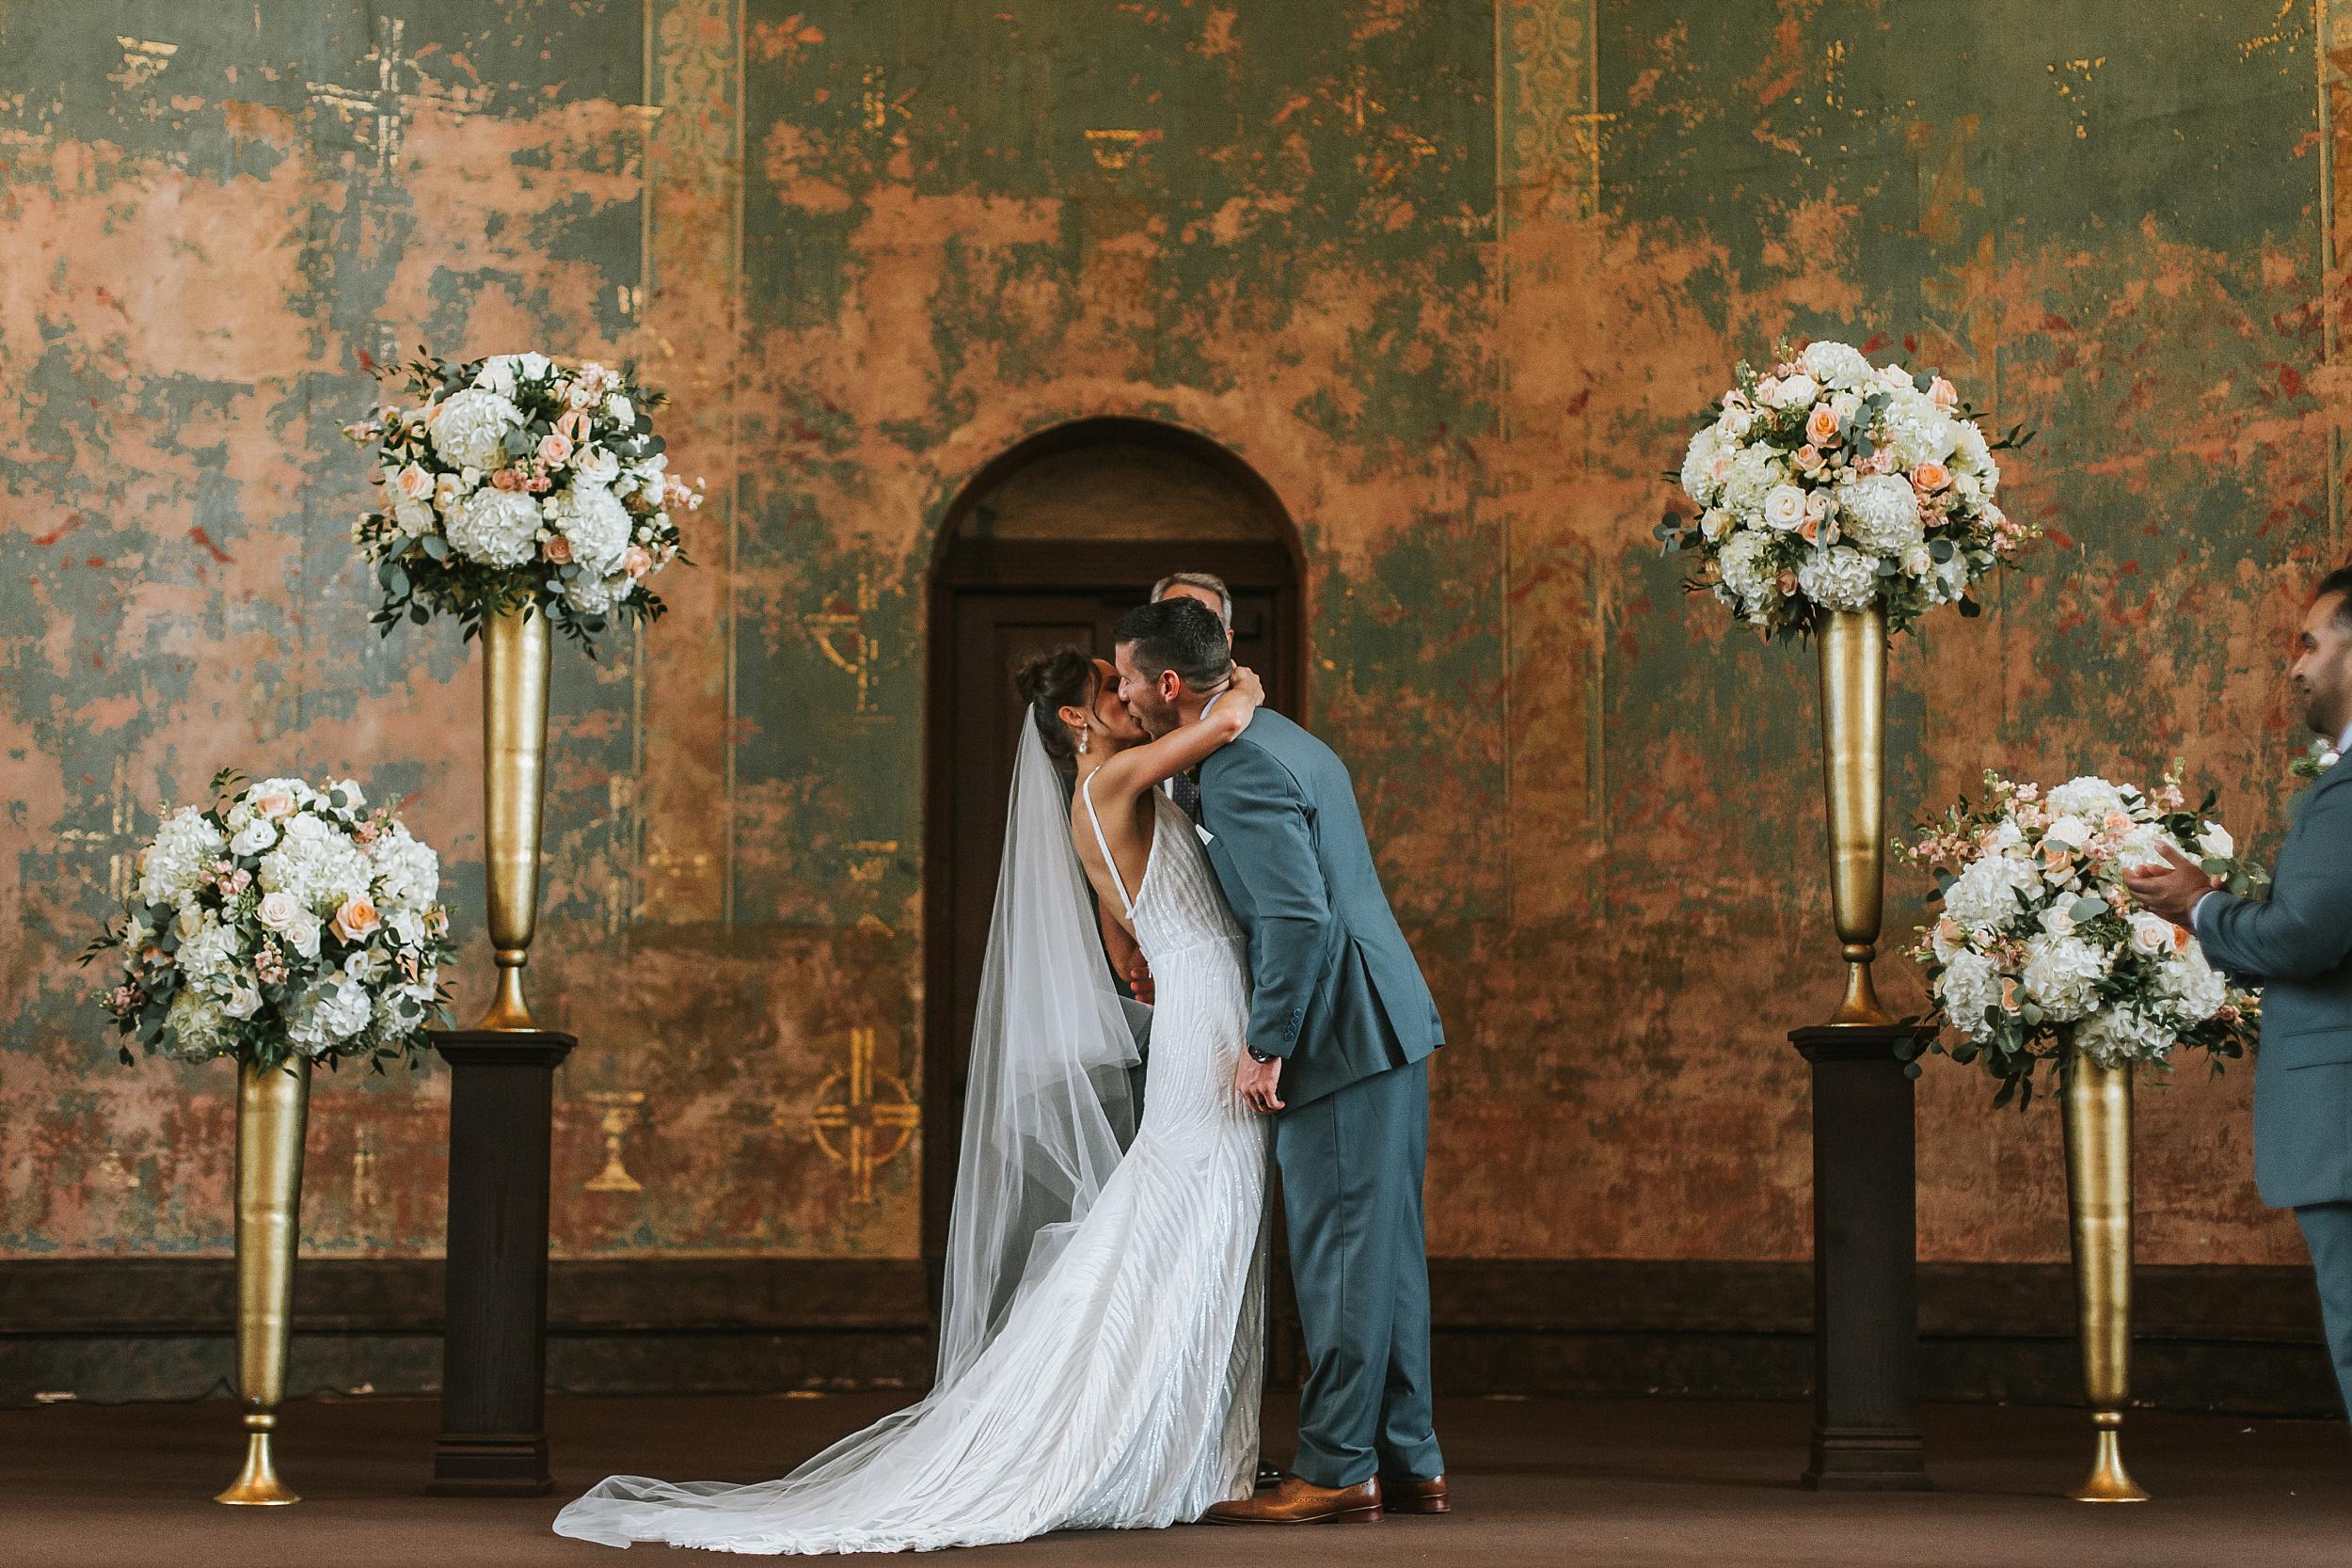 Brooke Townsend Photography - Cincinnati Wedding Photographer (125 of 170).jpg